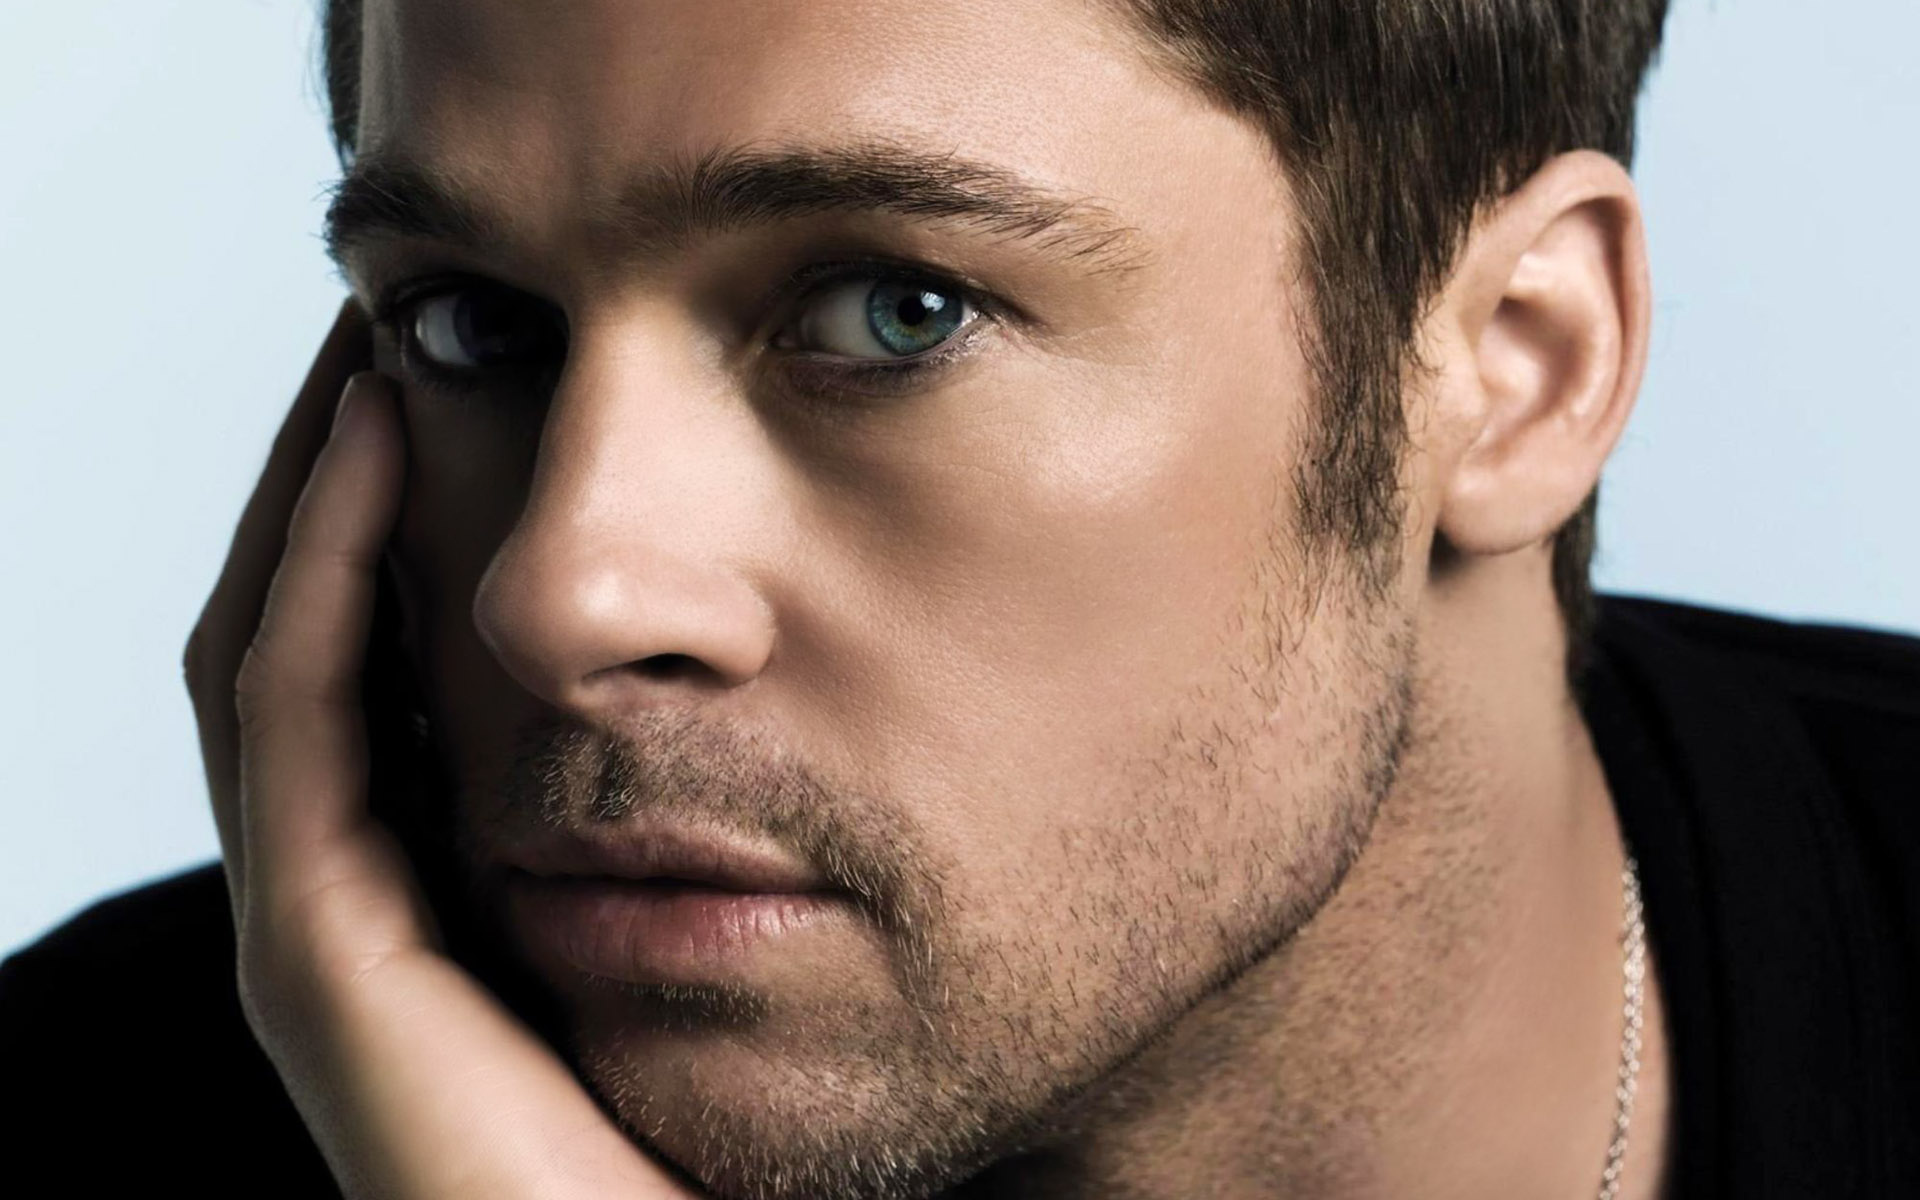 Brad Pitt Hd Wallpaper  Background Image  1920X1200  Id -9444